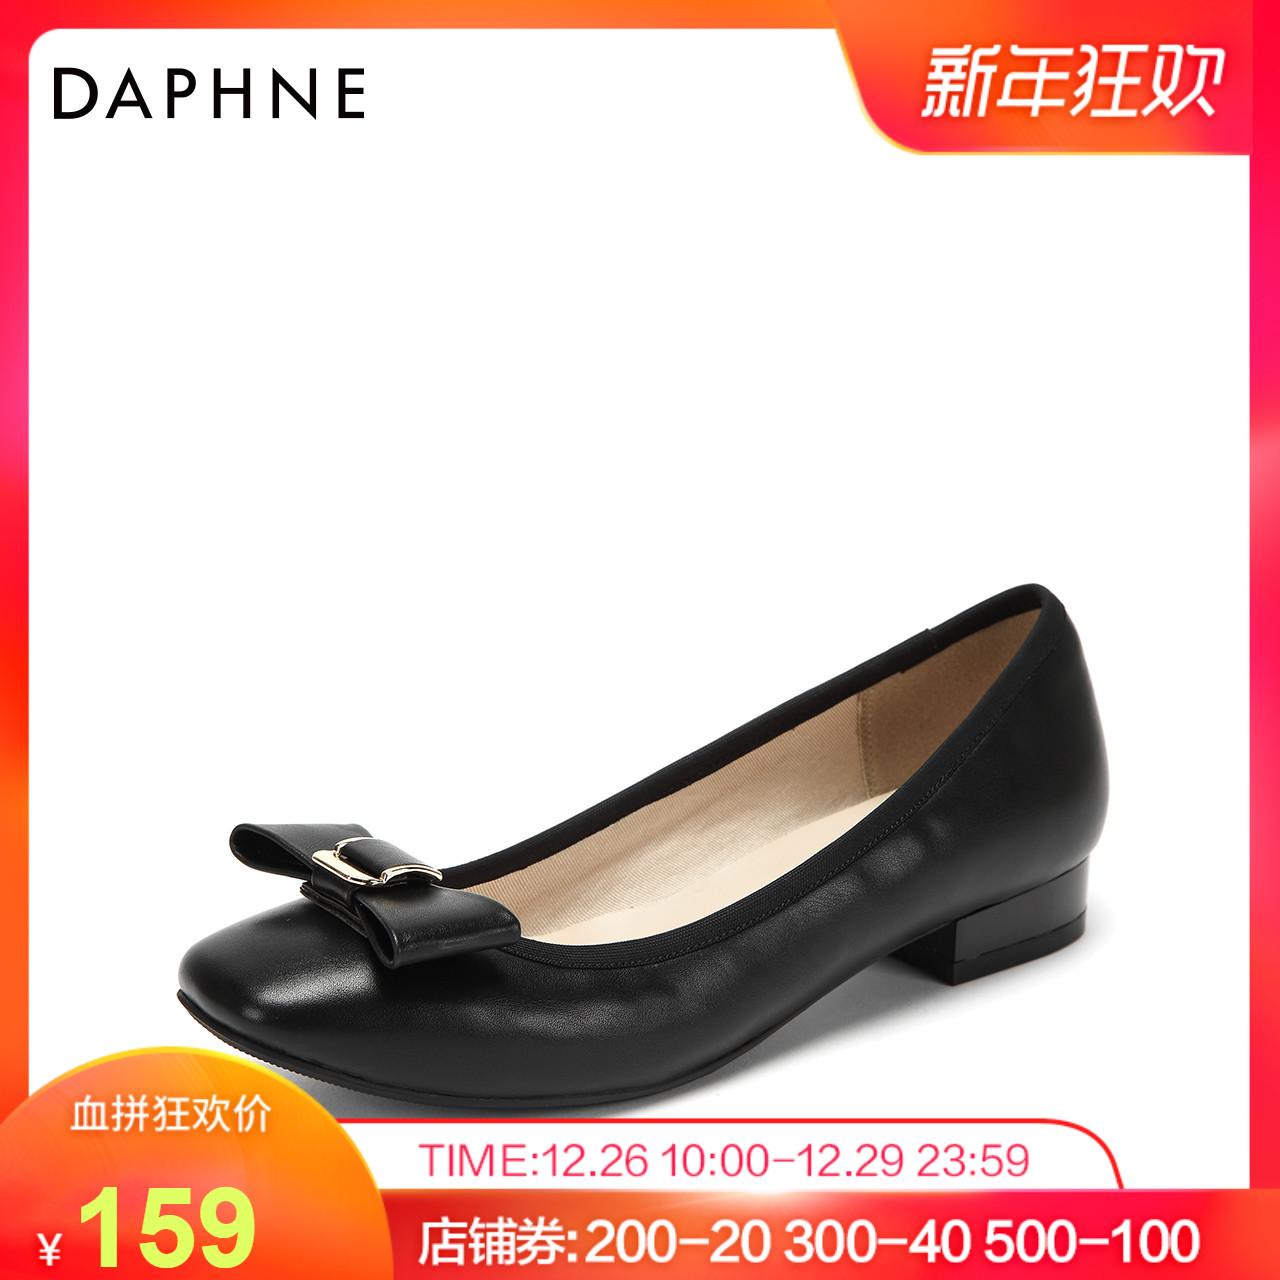 Daphne/达芙妮平底单鞋女2018新款秋蝴蝶结浅口韩版低跟女鞋